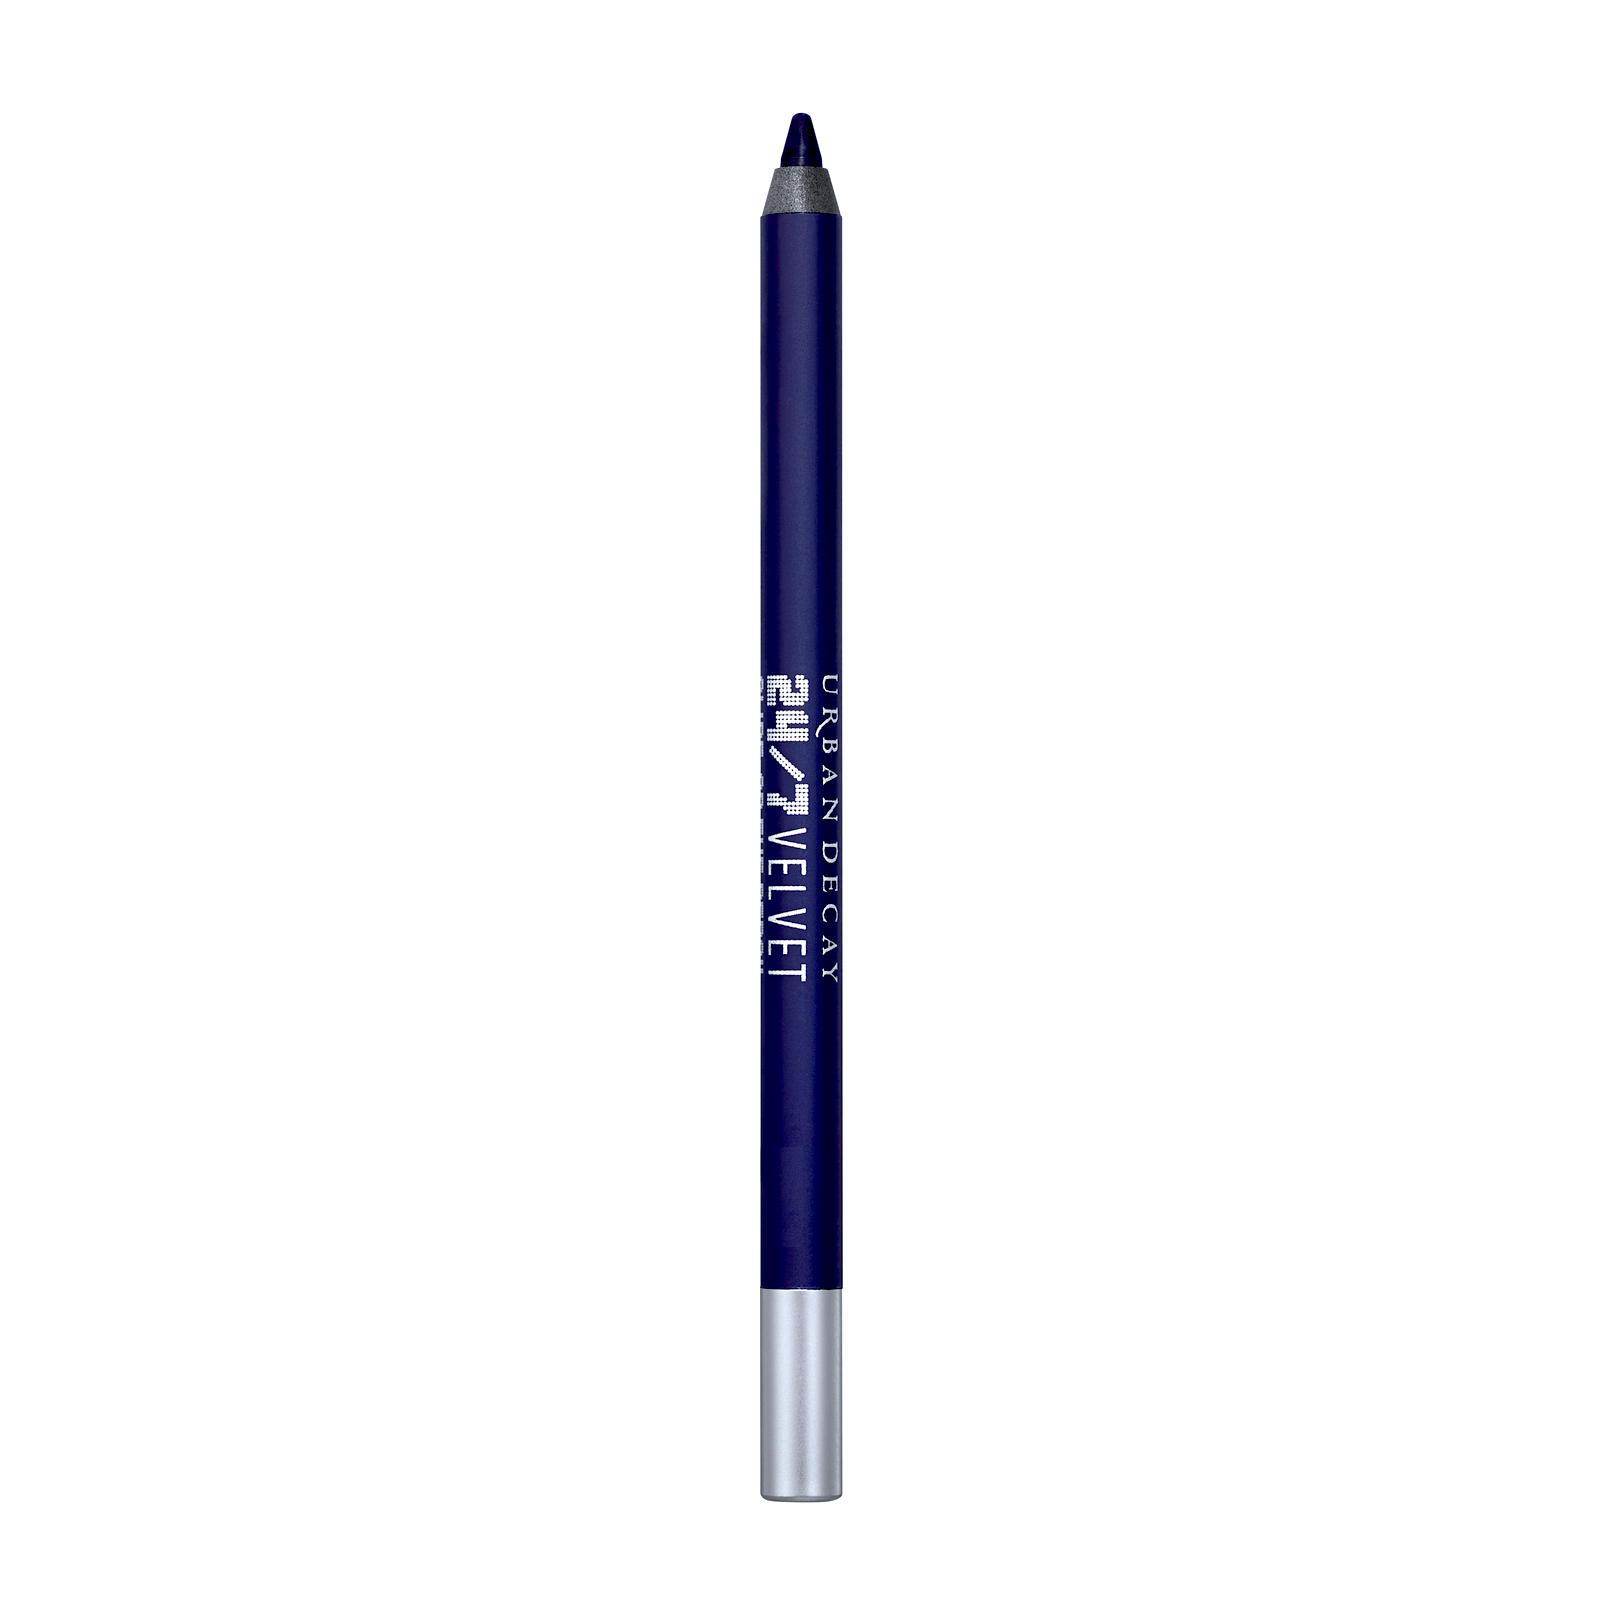 Urban Decay 24/7 Glide-On Eye Pencil Ultraviolet